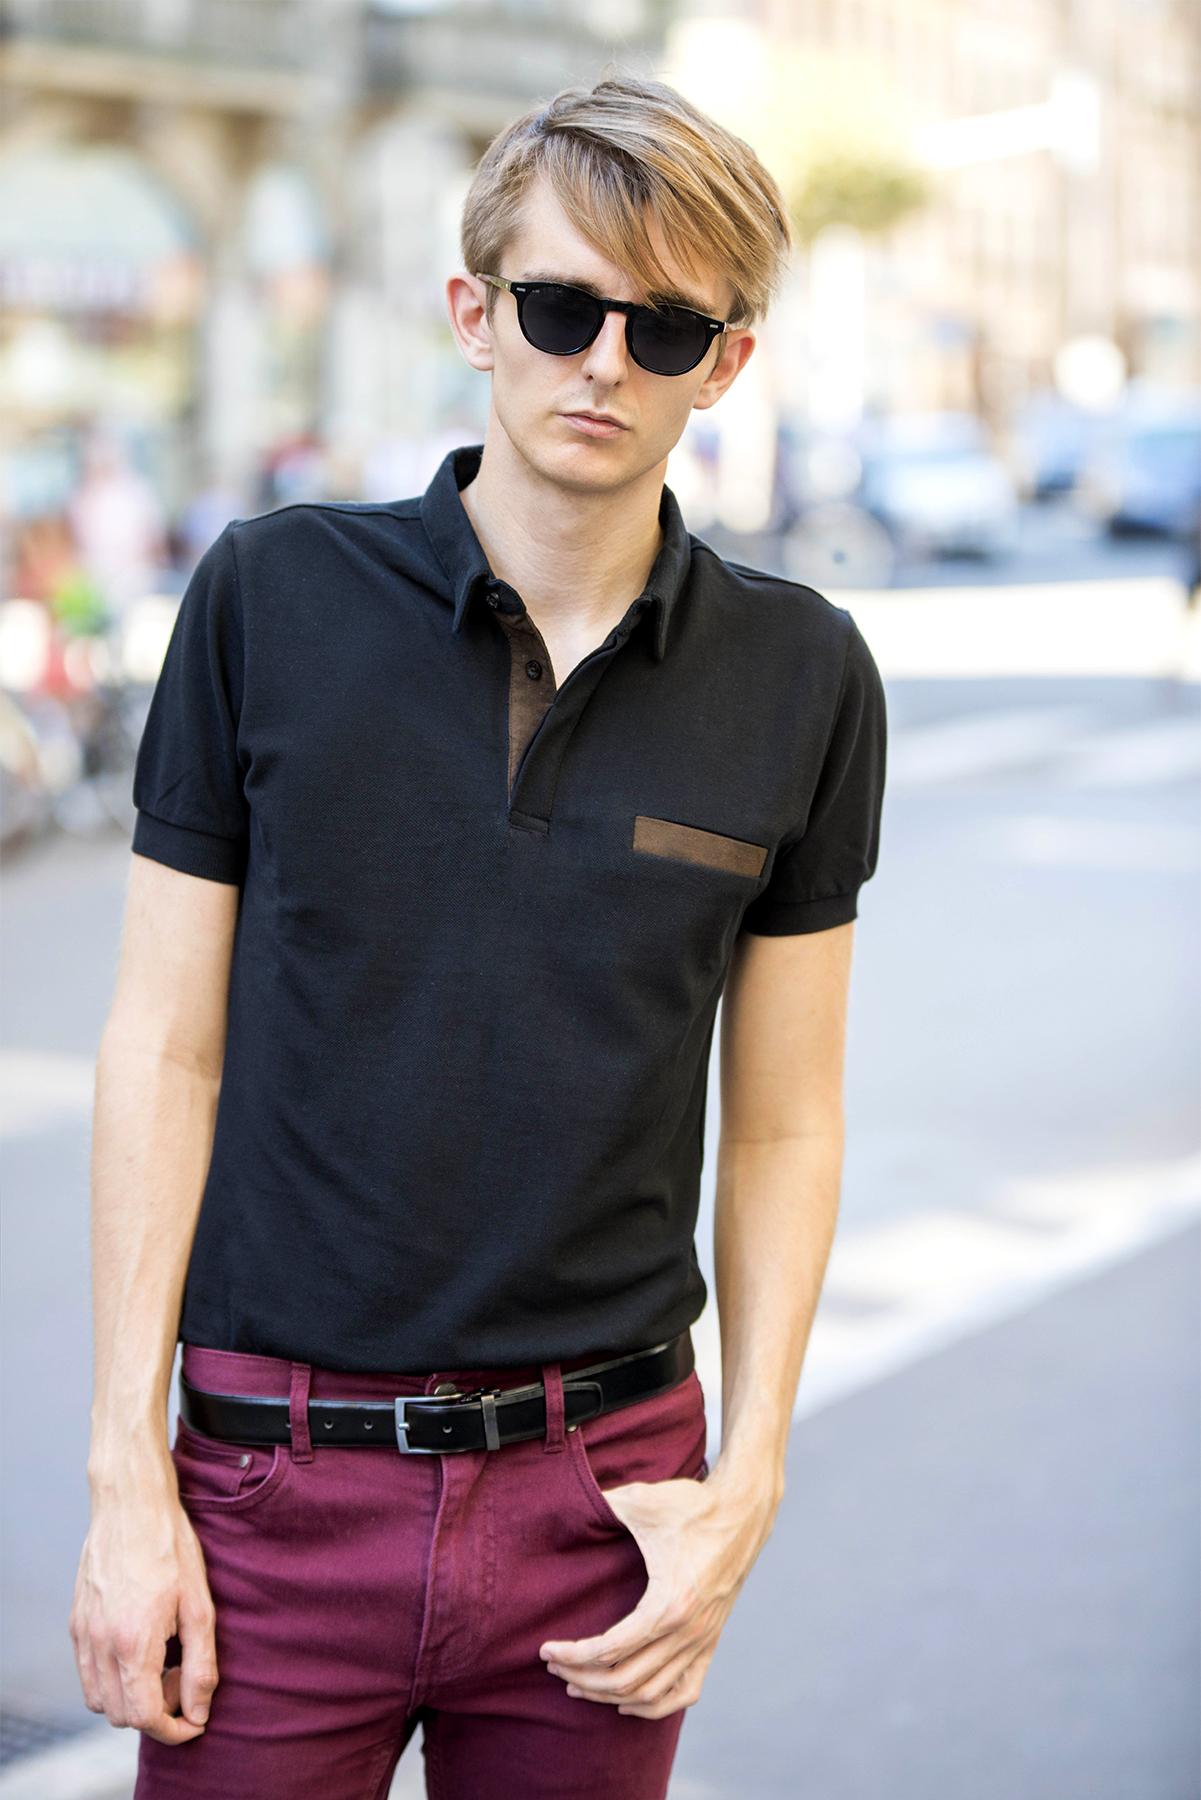 blog-mode-homme-strasbourg-paris-blogueur-fashion-blogger-man-men-french-streetstyle-lookbook-vinifera-alsace-france-2